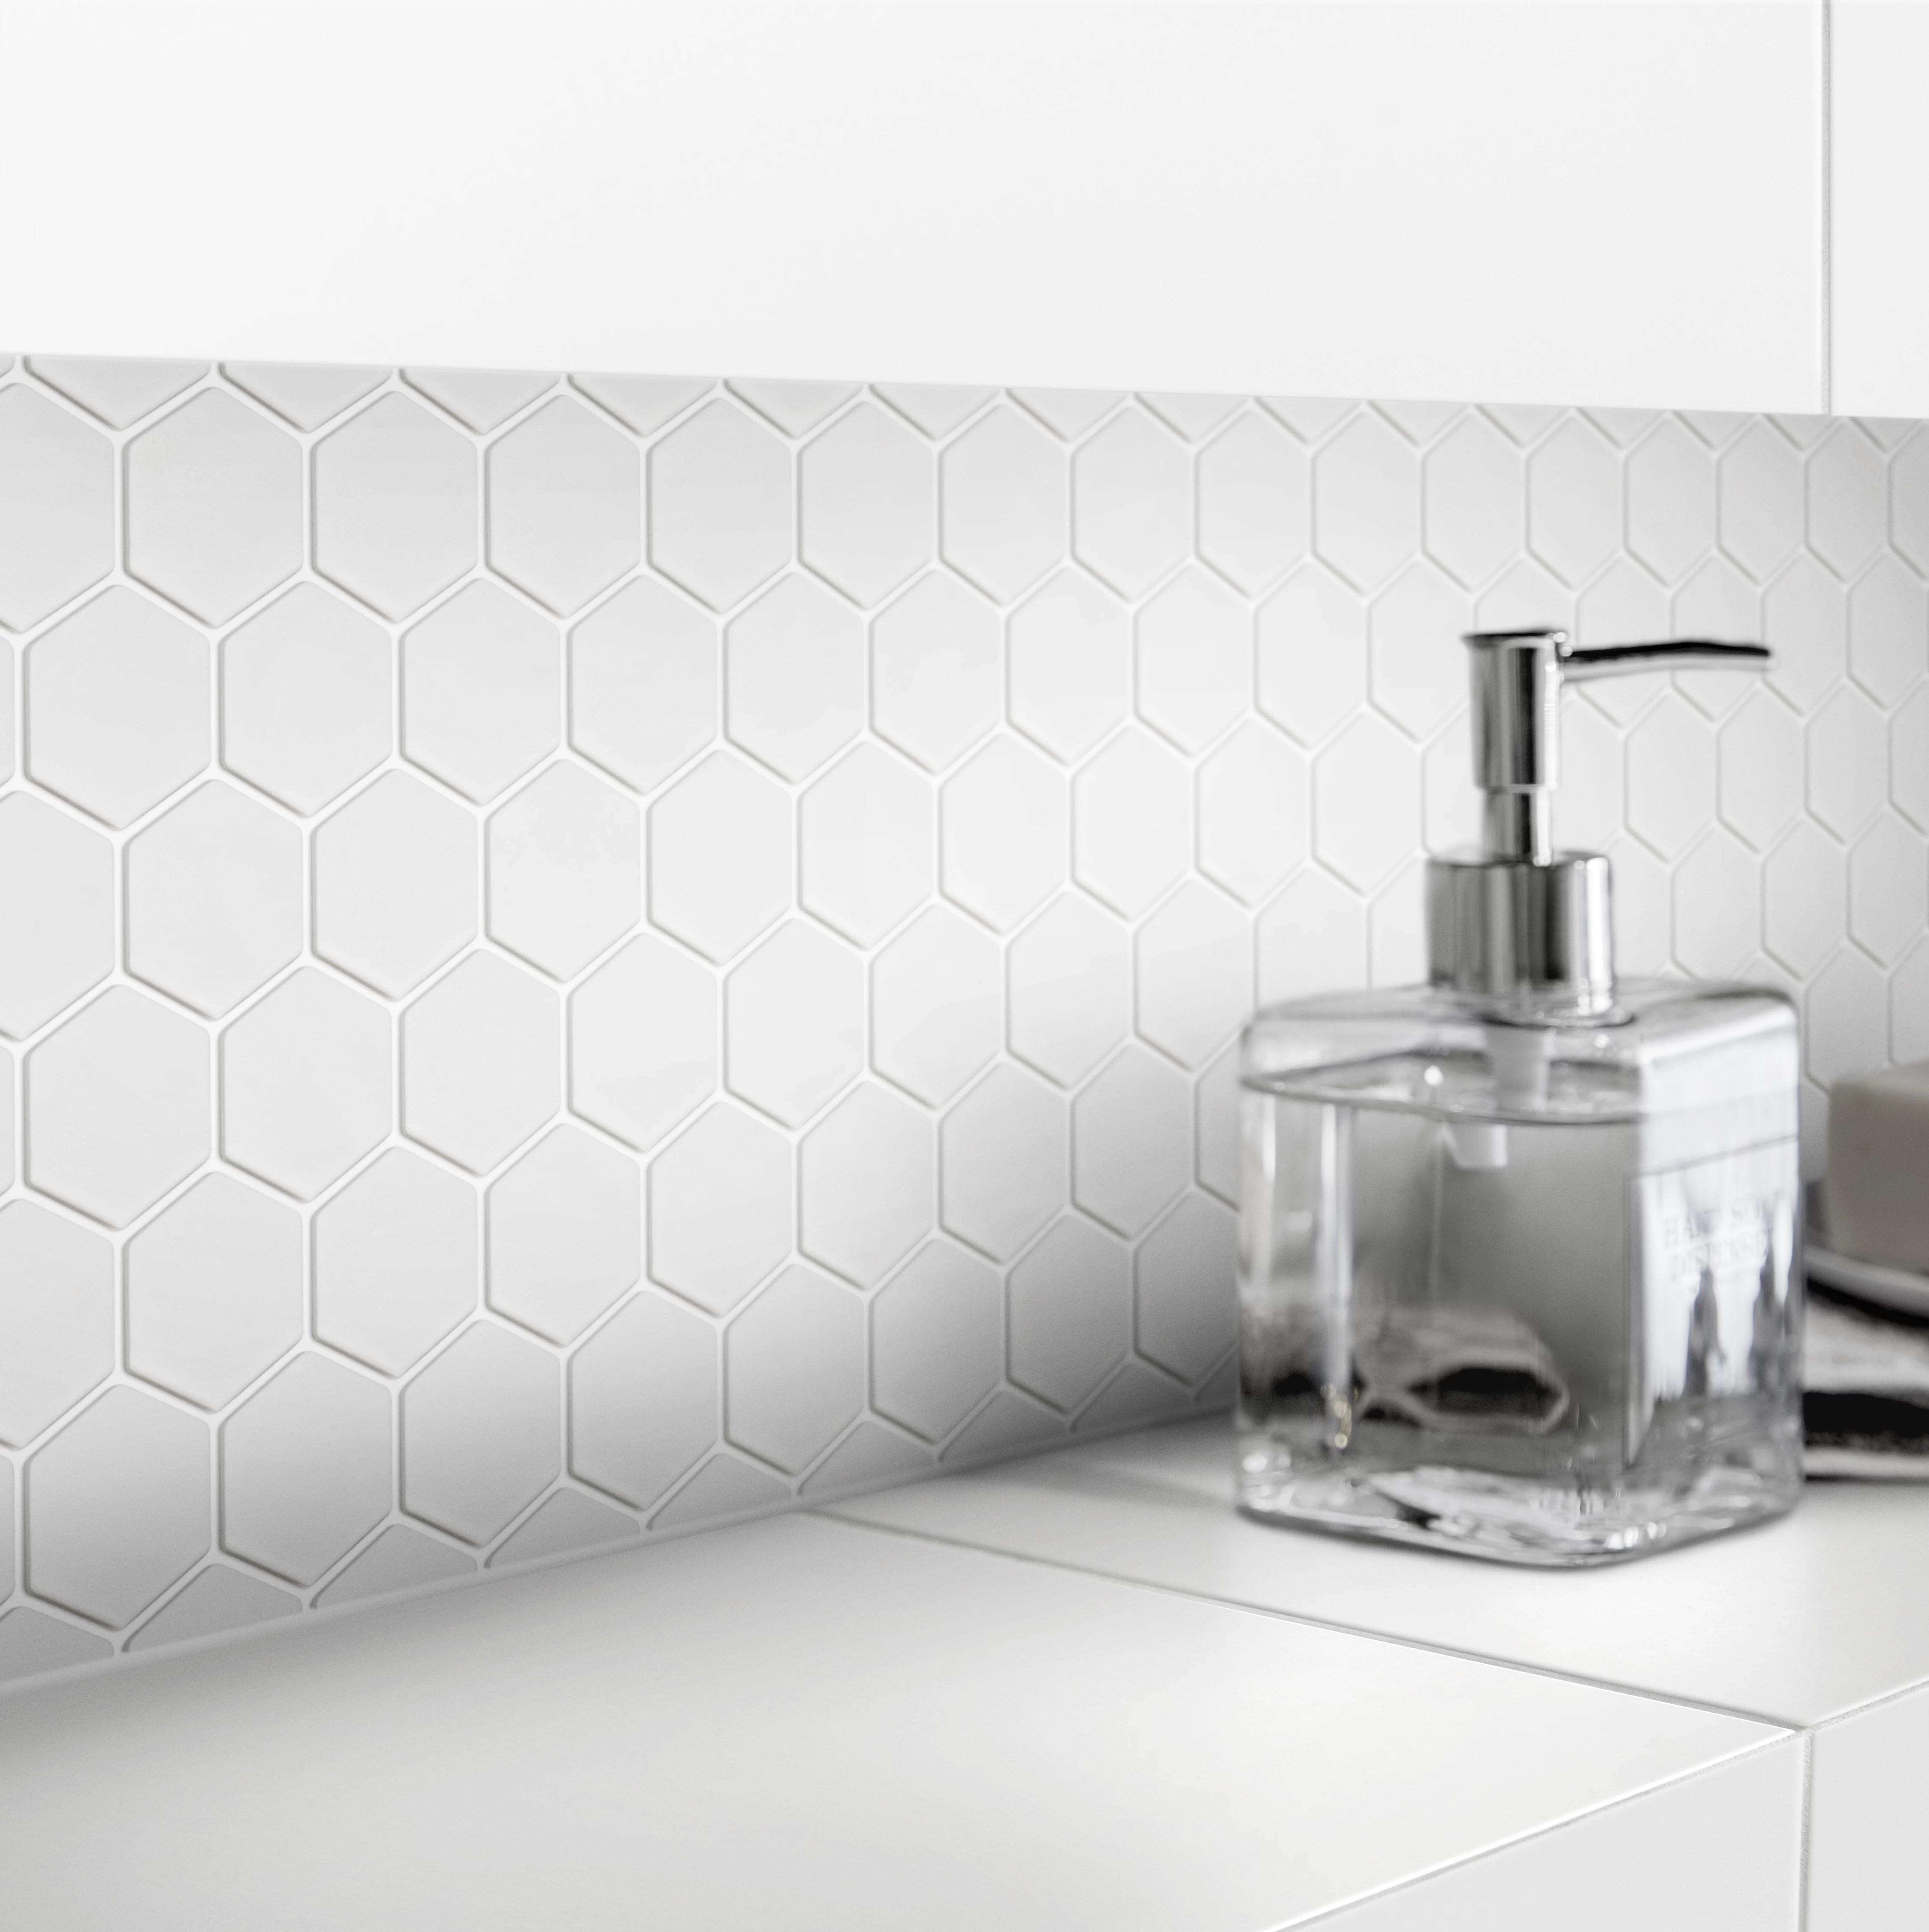 plain white plain glass mosaic tile sheets l 300mm w 300mm